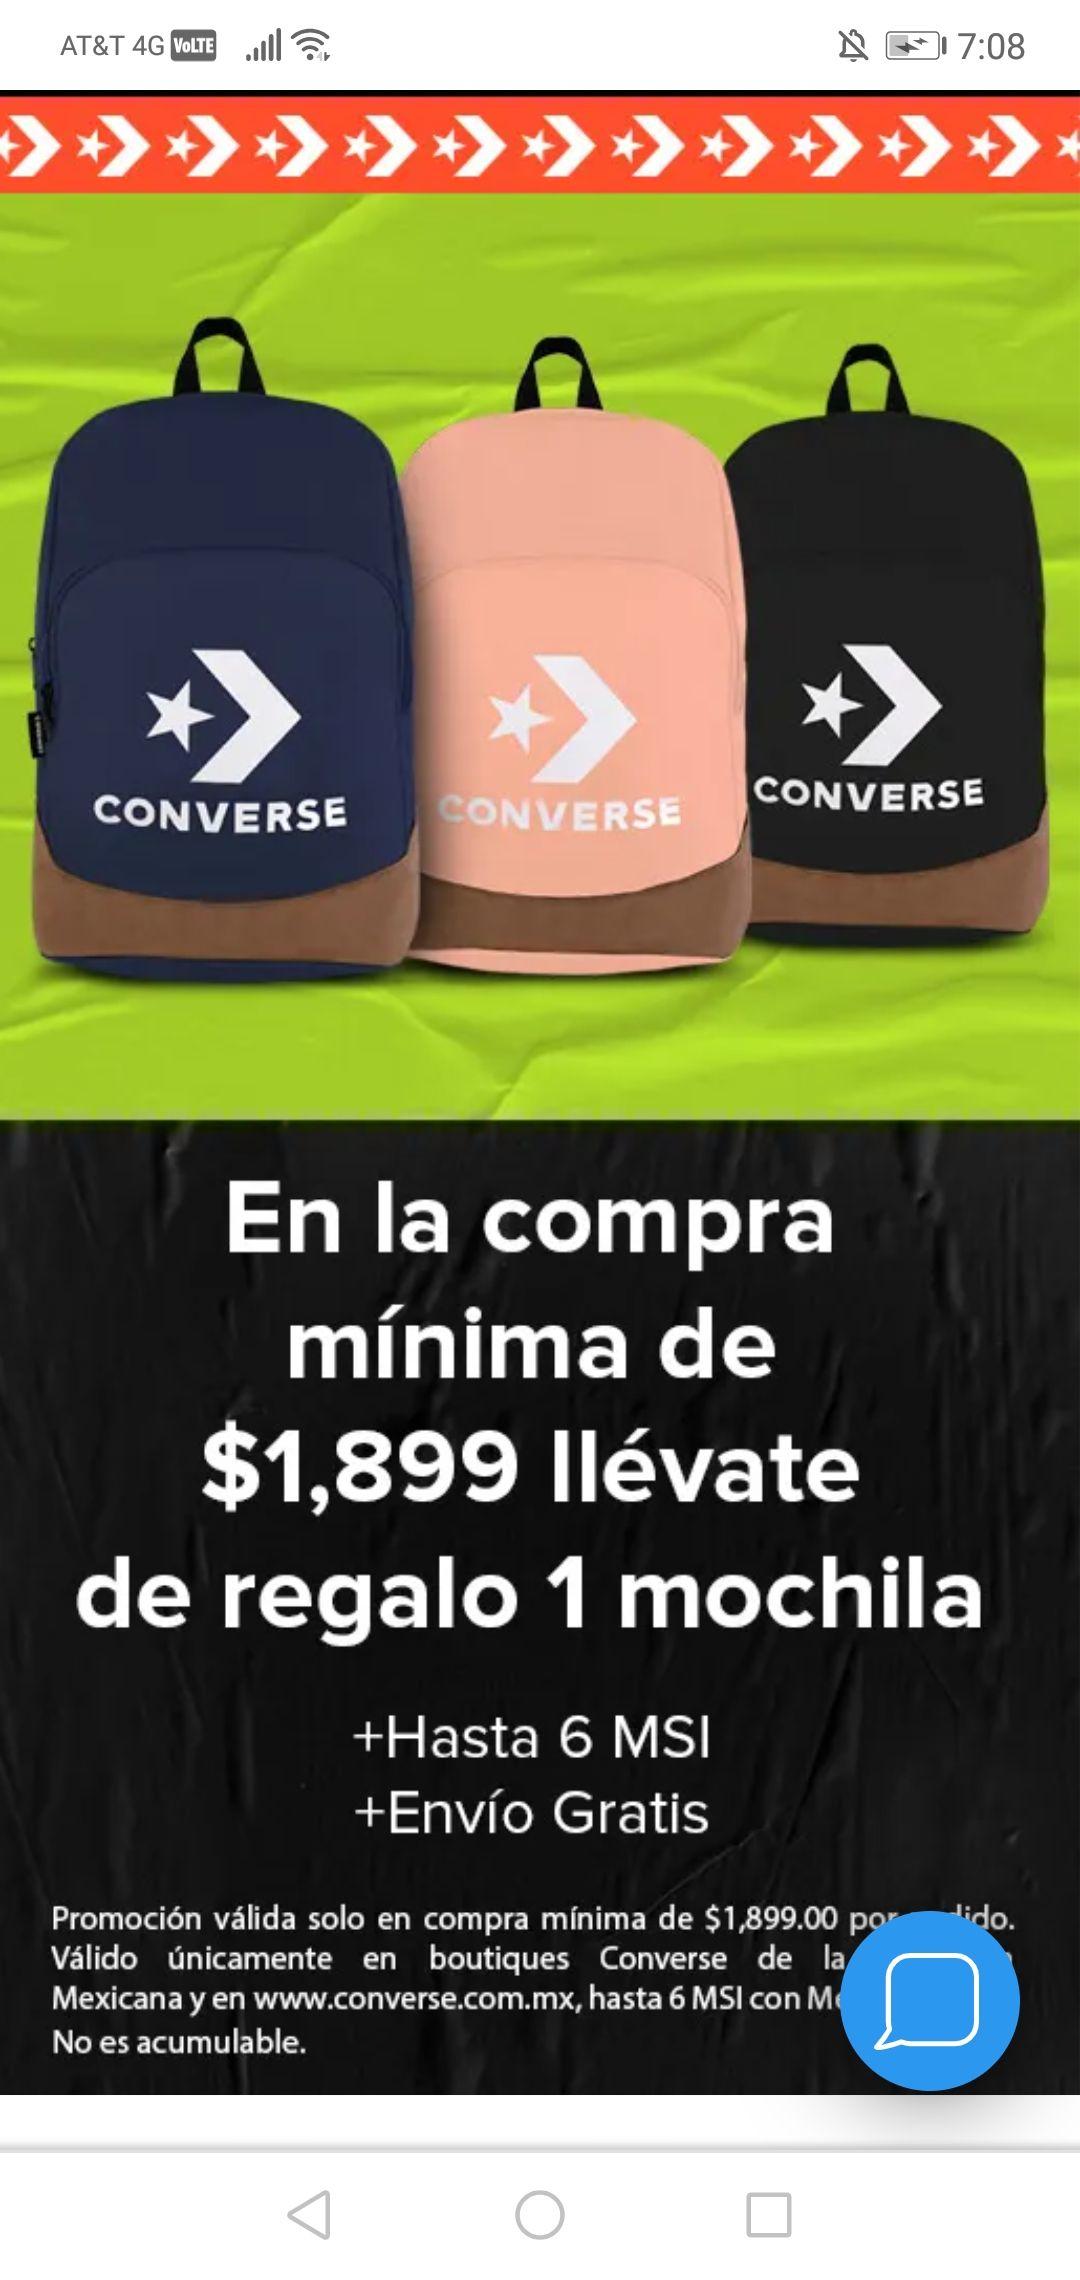 Converse, mochila gratis ($1,899.00)